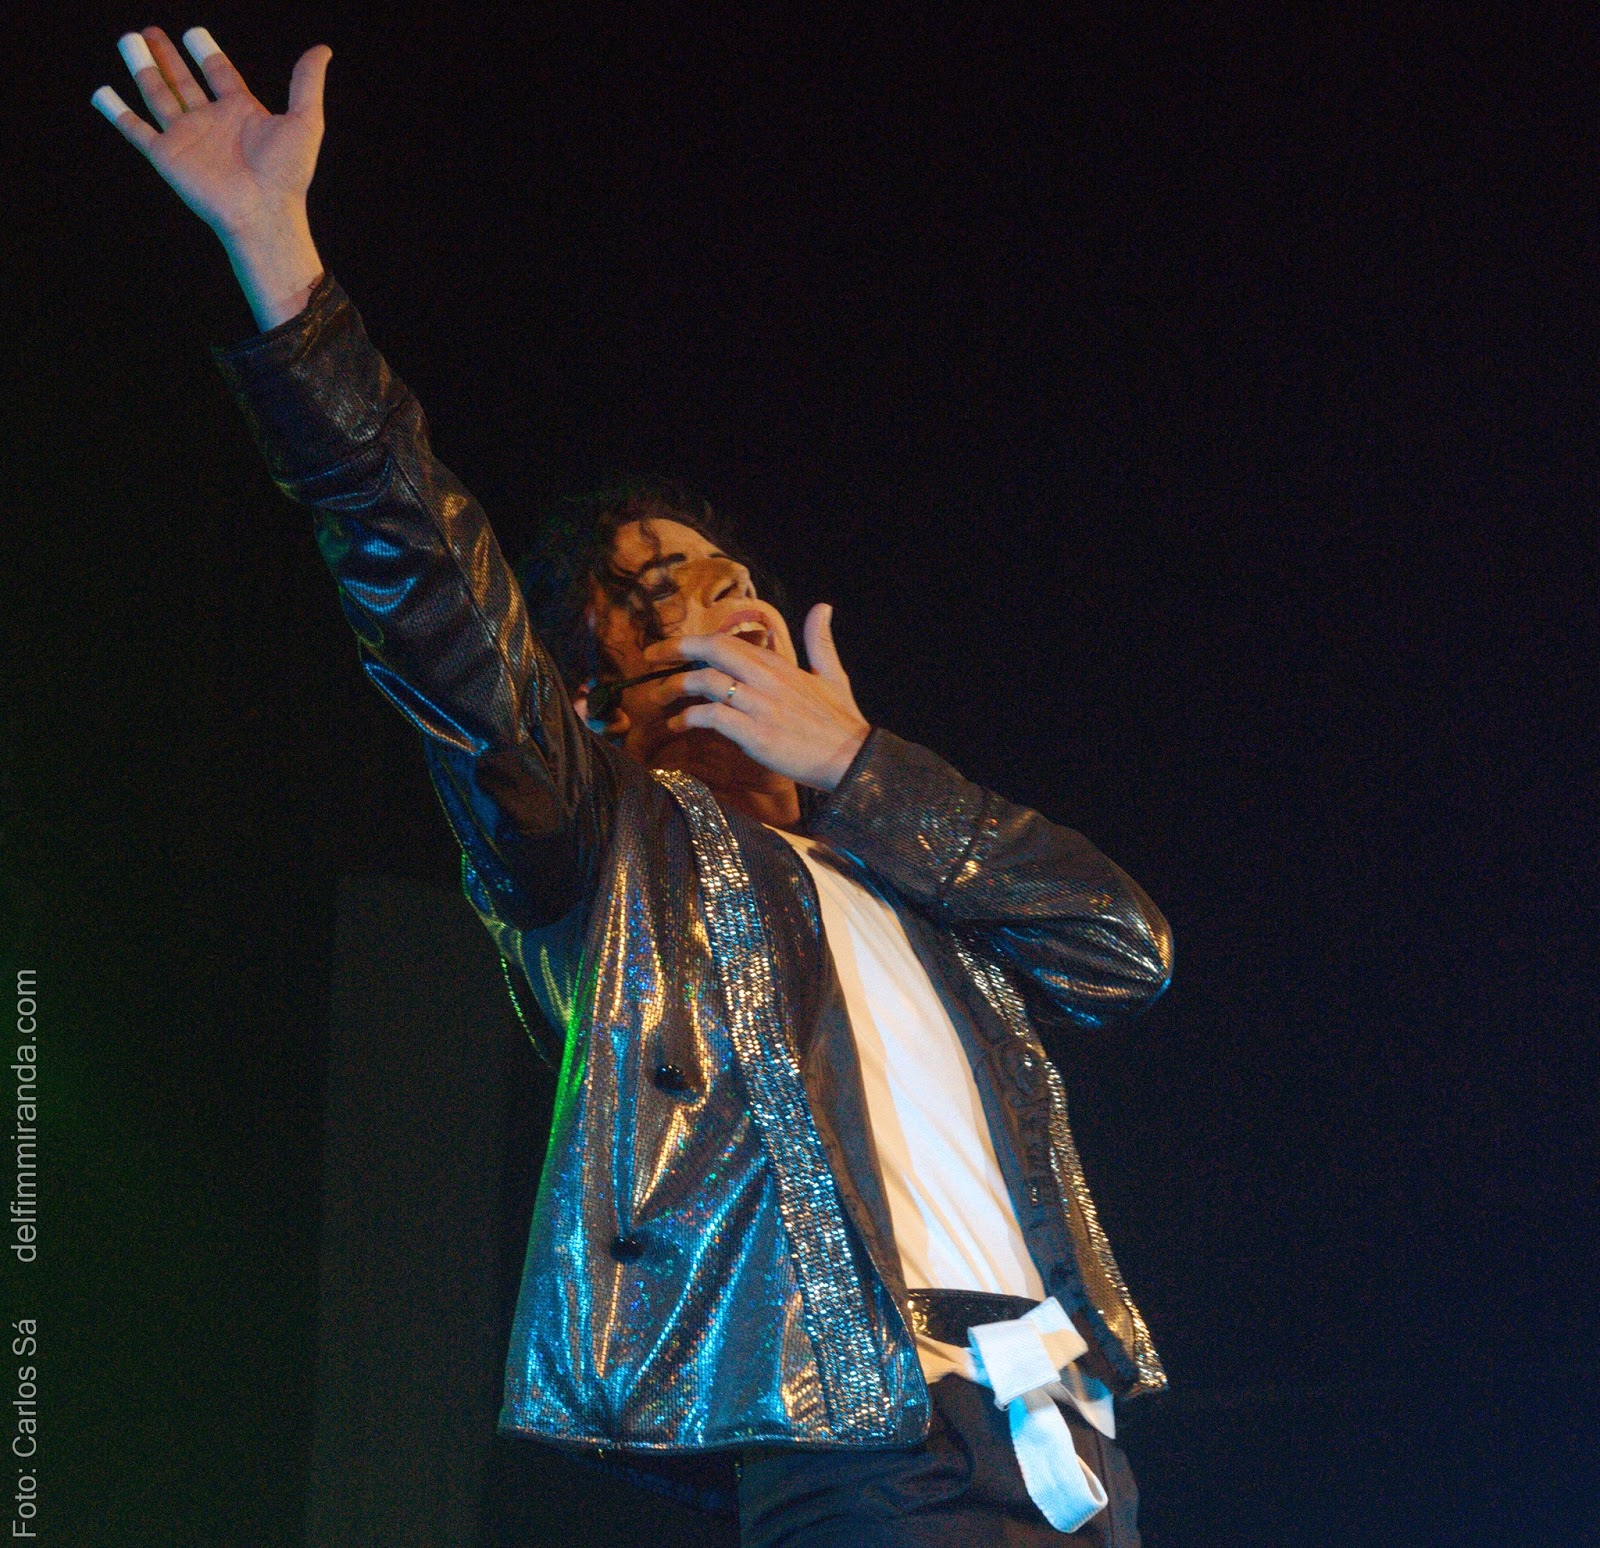 Delfim Miranda - Michael Jackson Tribute - Behind the Mask